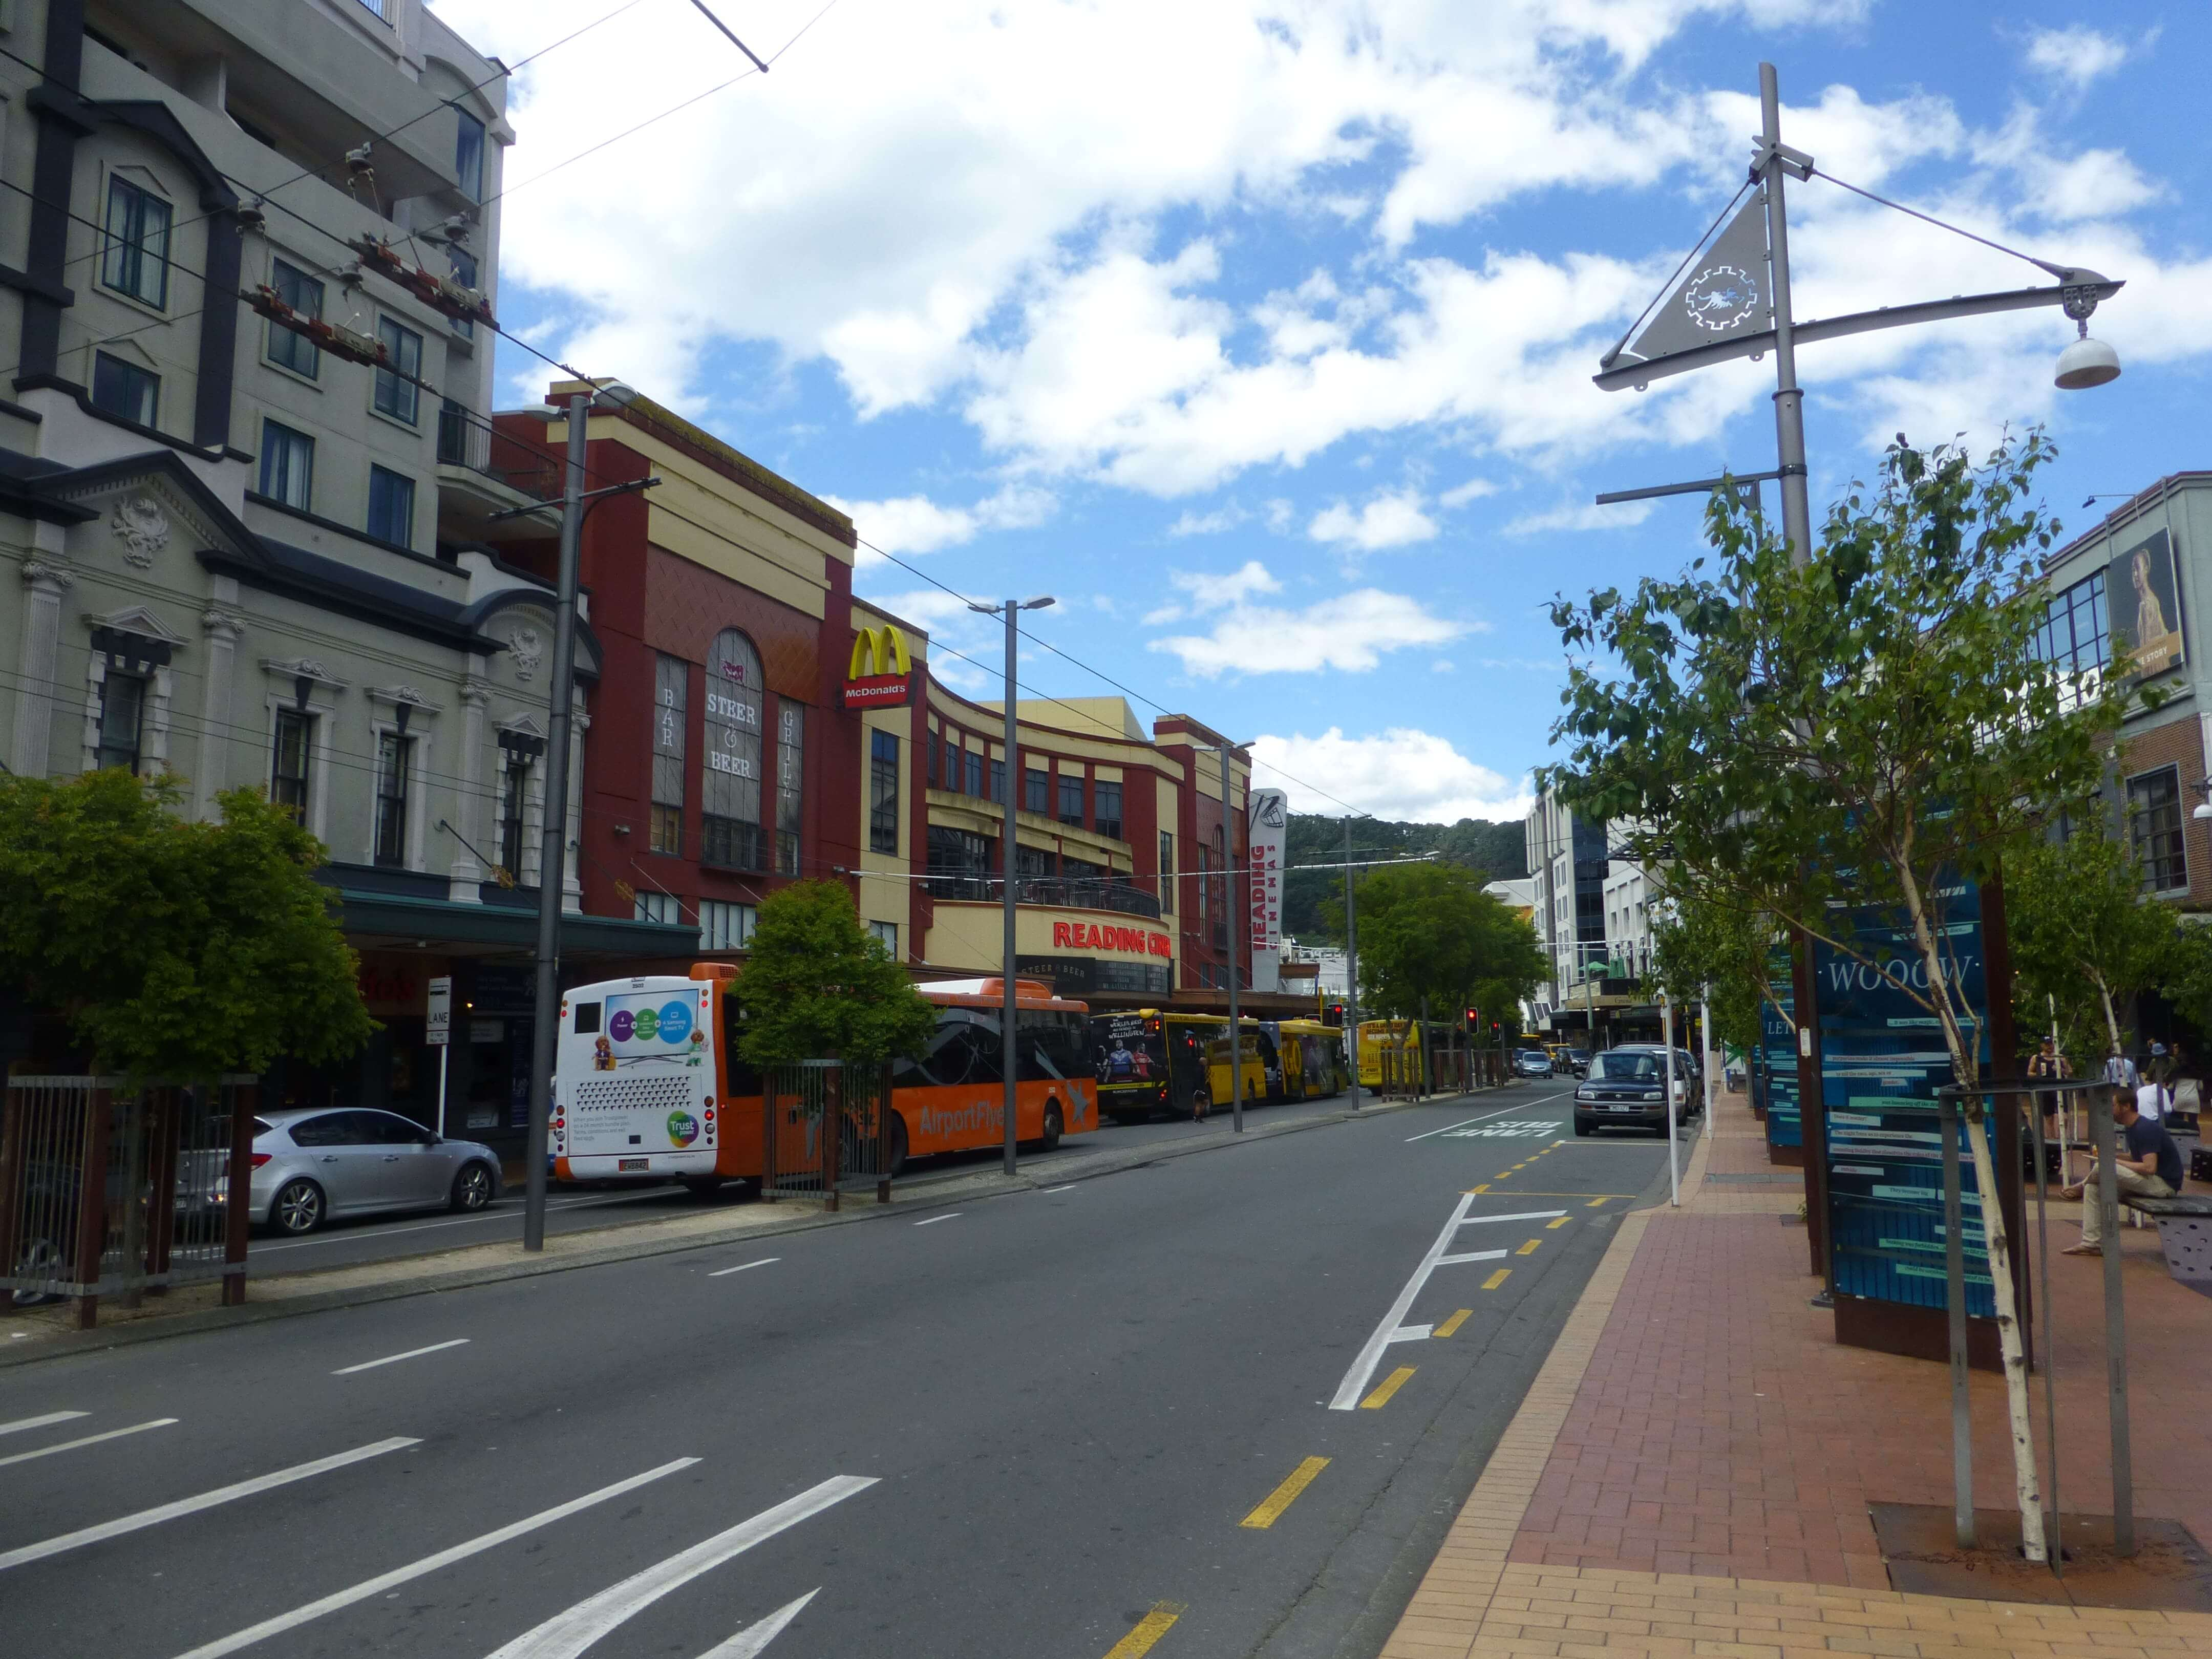 im Zentrum, Wellington, Neuseeland, Weit-weg.reisen 18